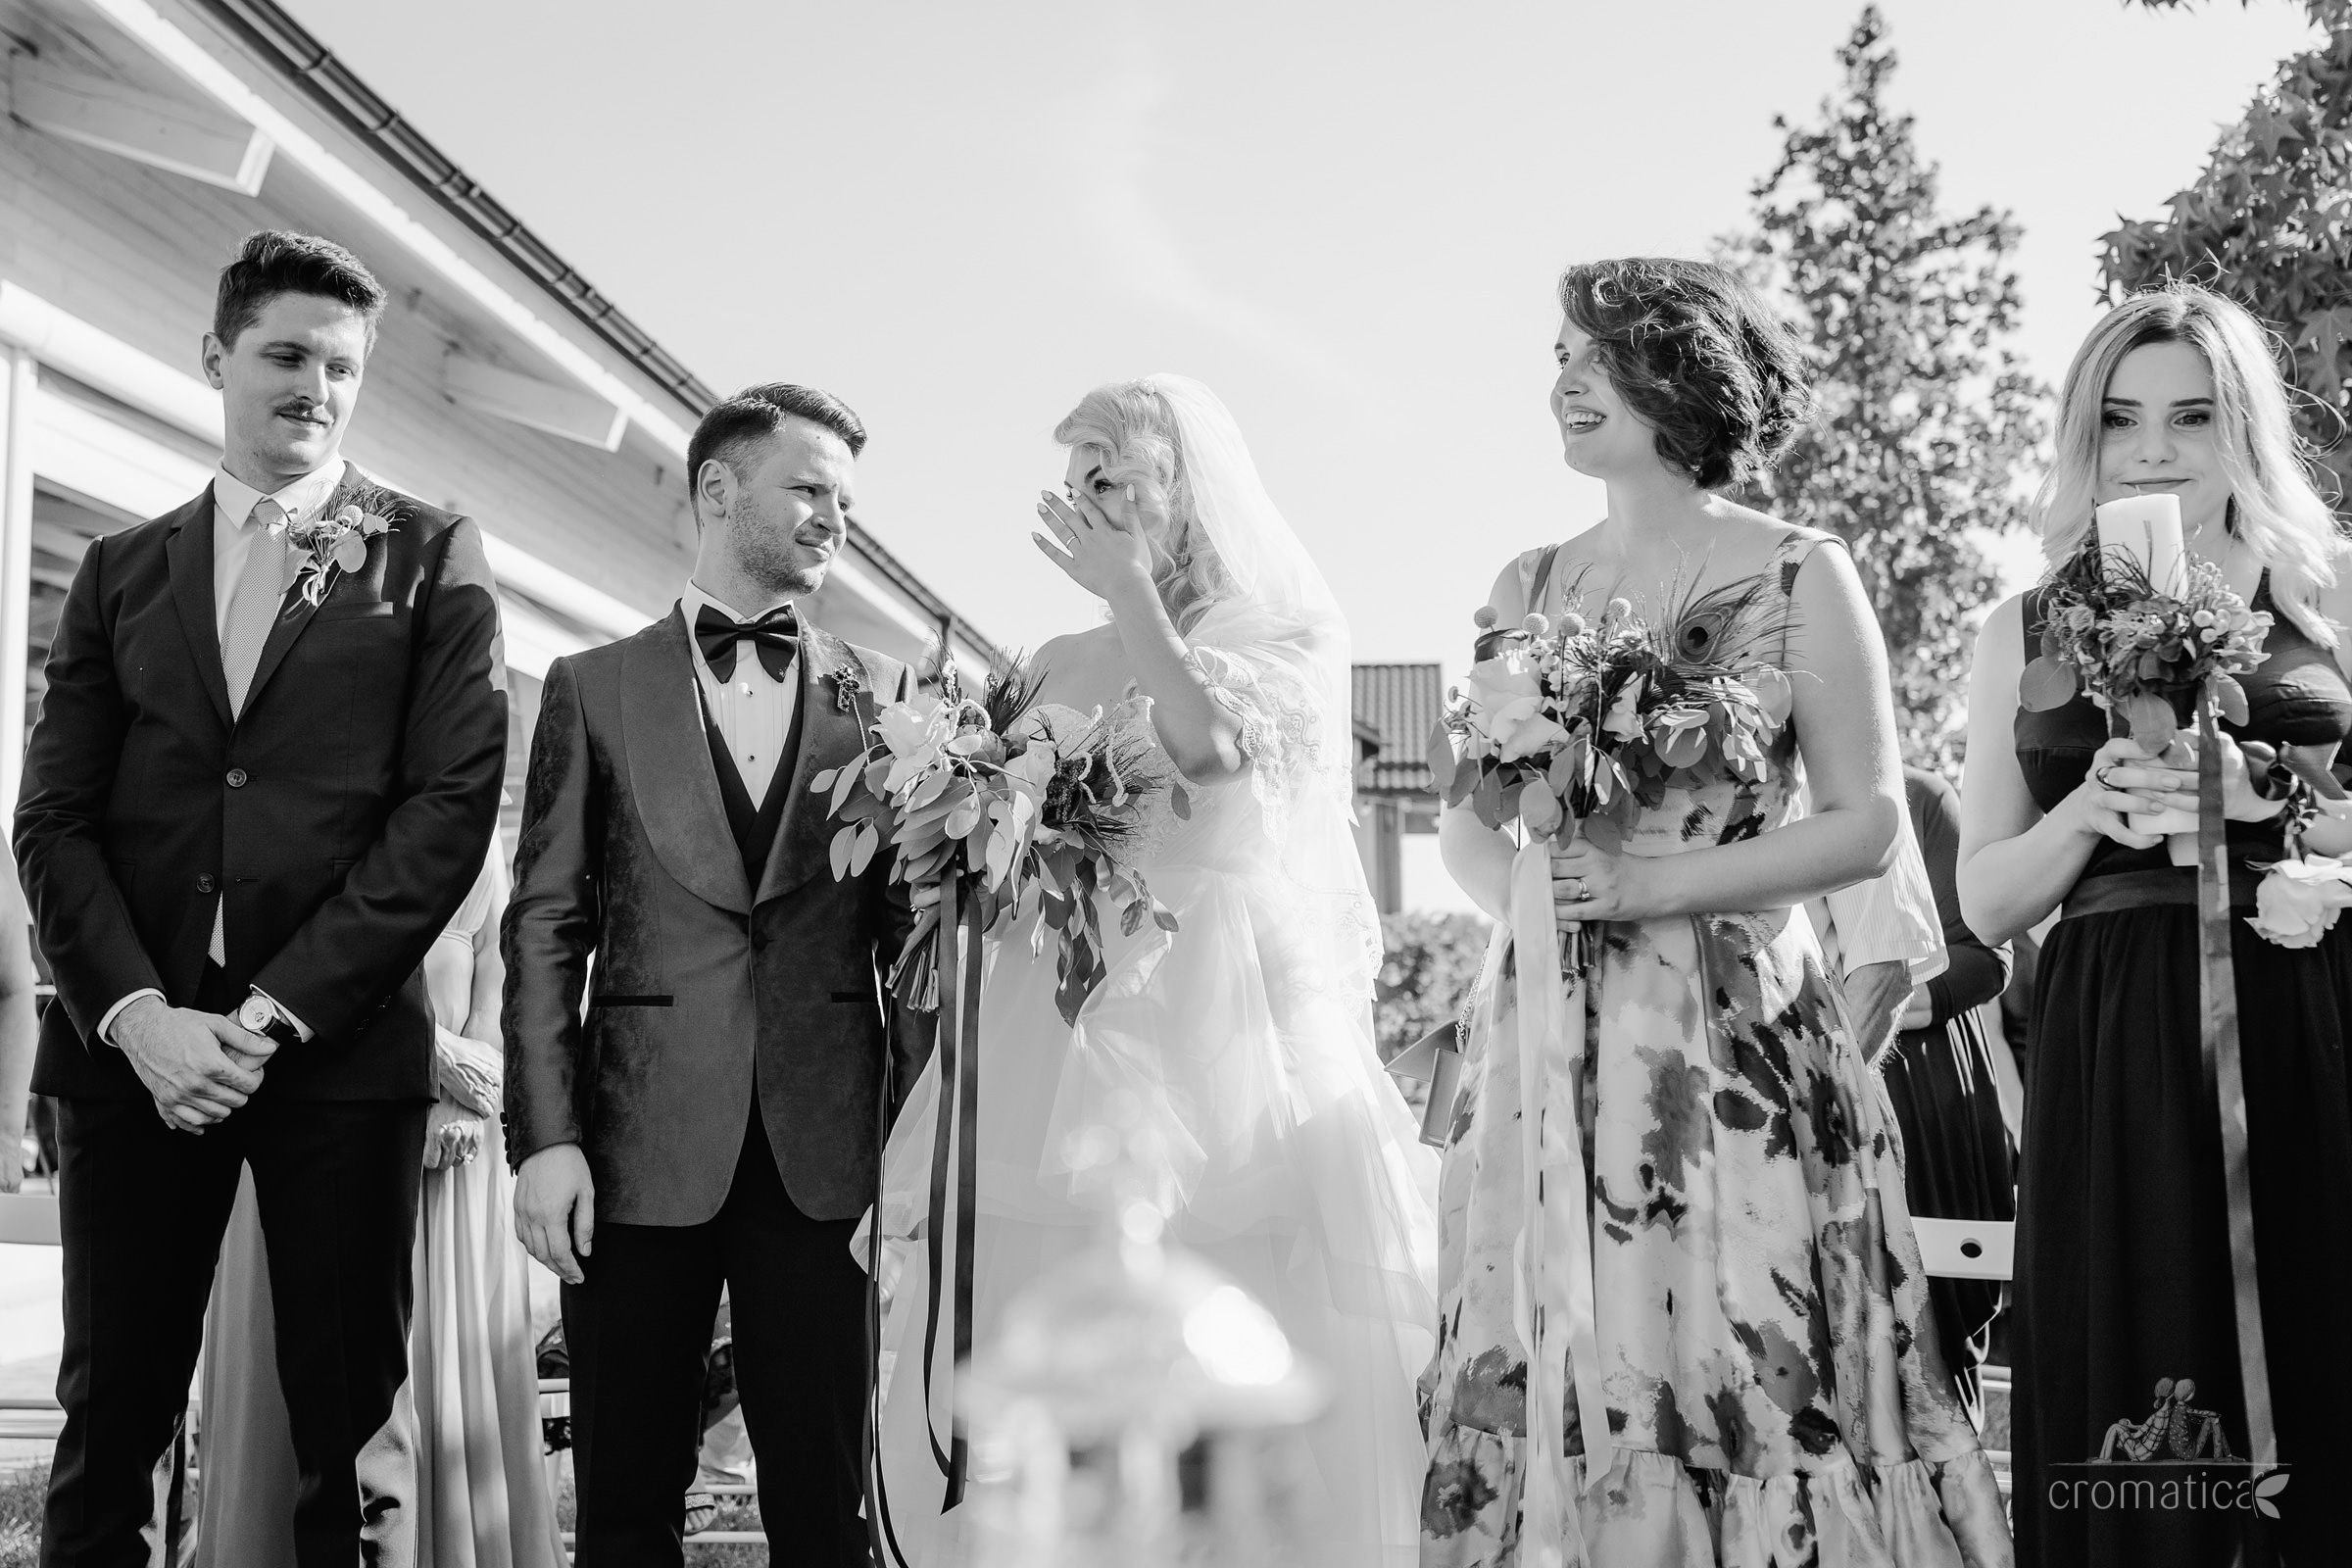 ana mihai fotografii nunta gradina lahovari 044